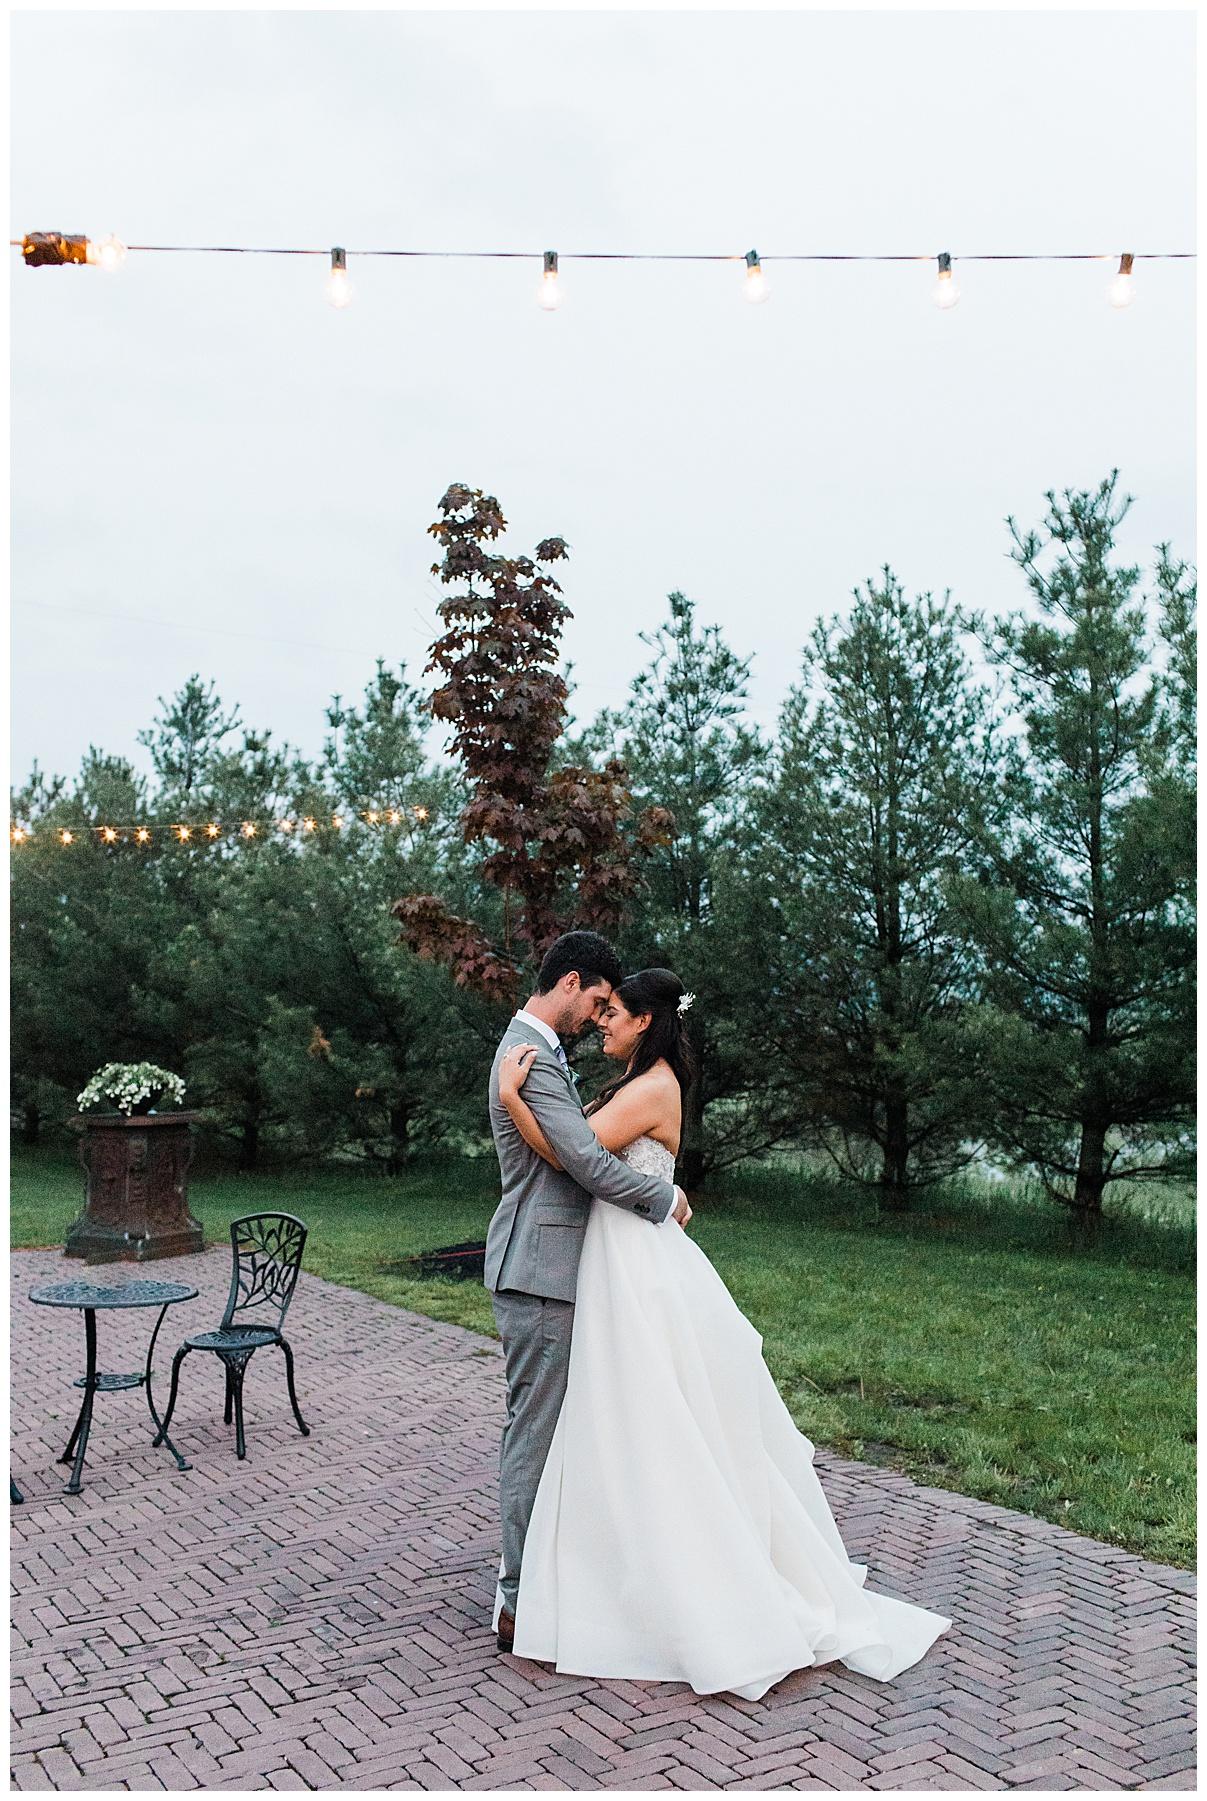 Bride and groom slow dance outside under string lights| Outdoor wedding| Belcroft Estate Wedding| Toronto wedding photographer| Ontario wedding photographer| 3photography